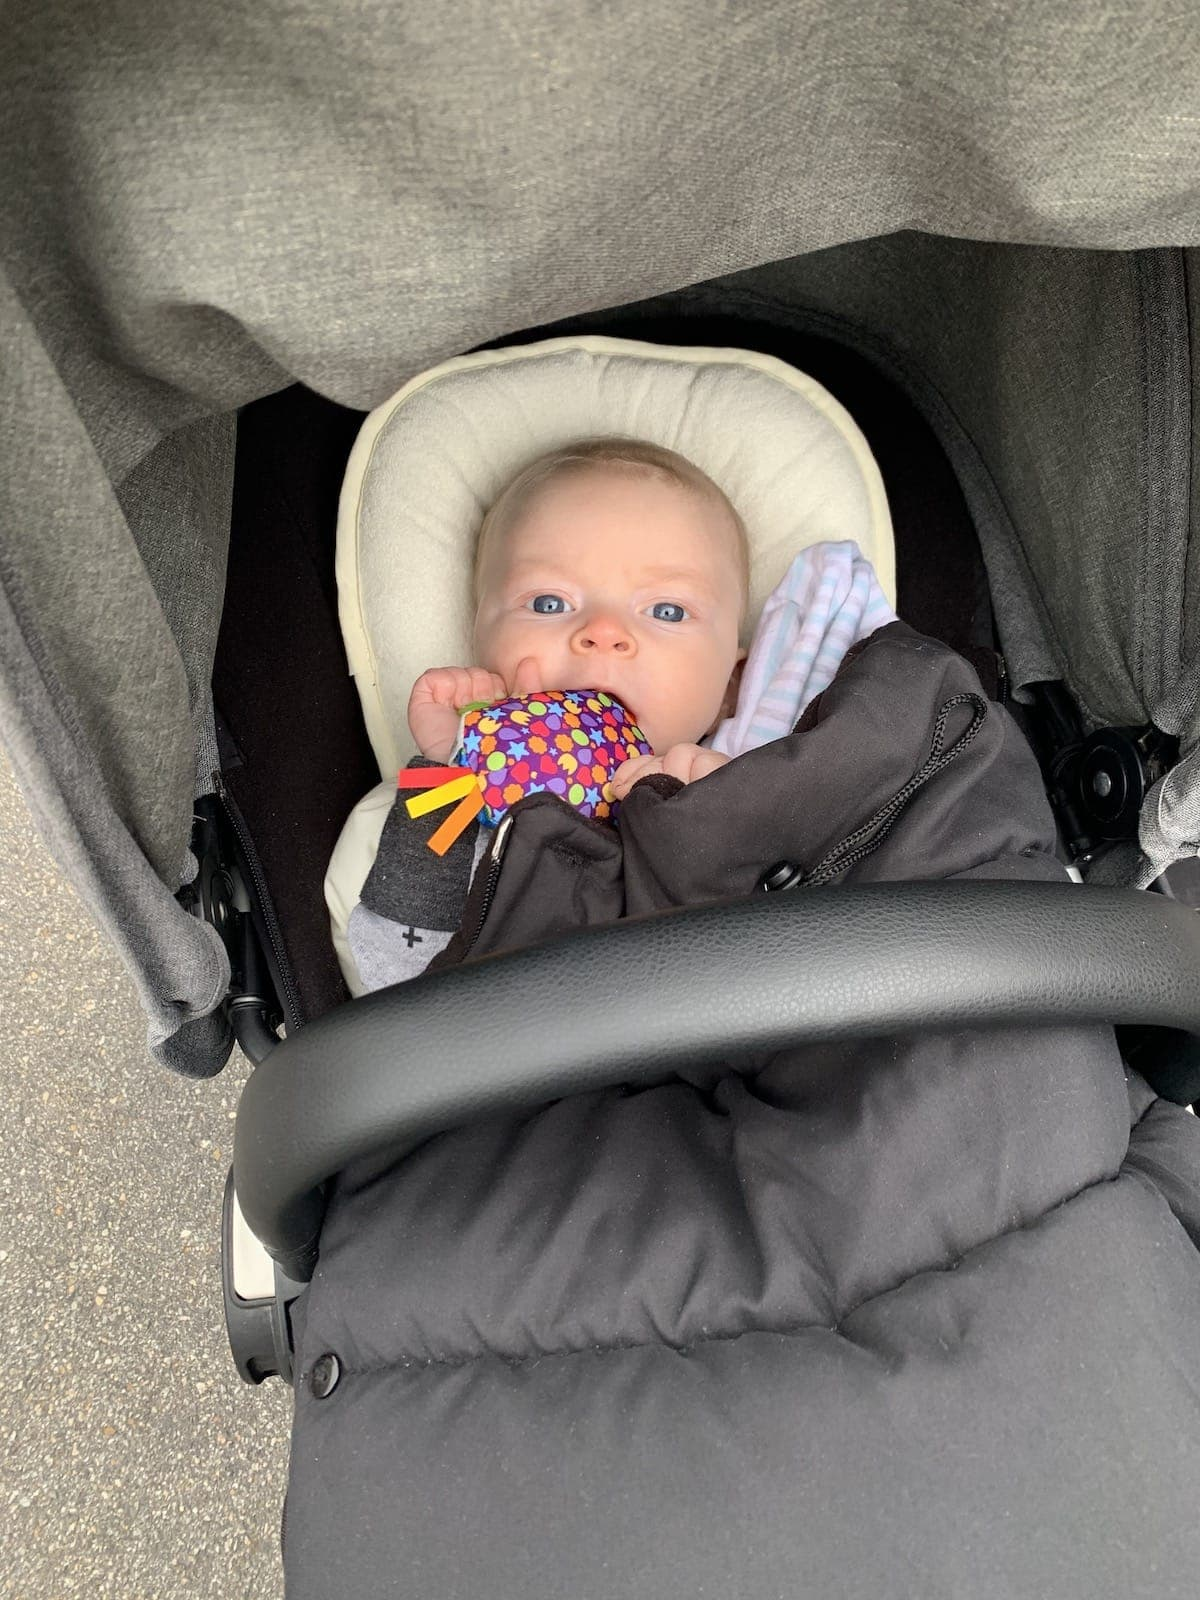 Porter in a stroller